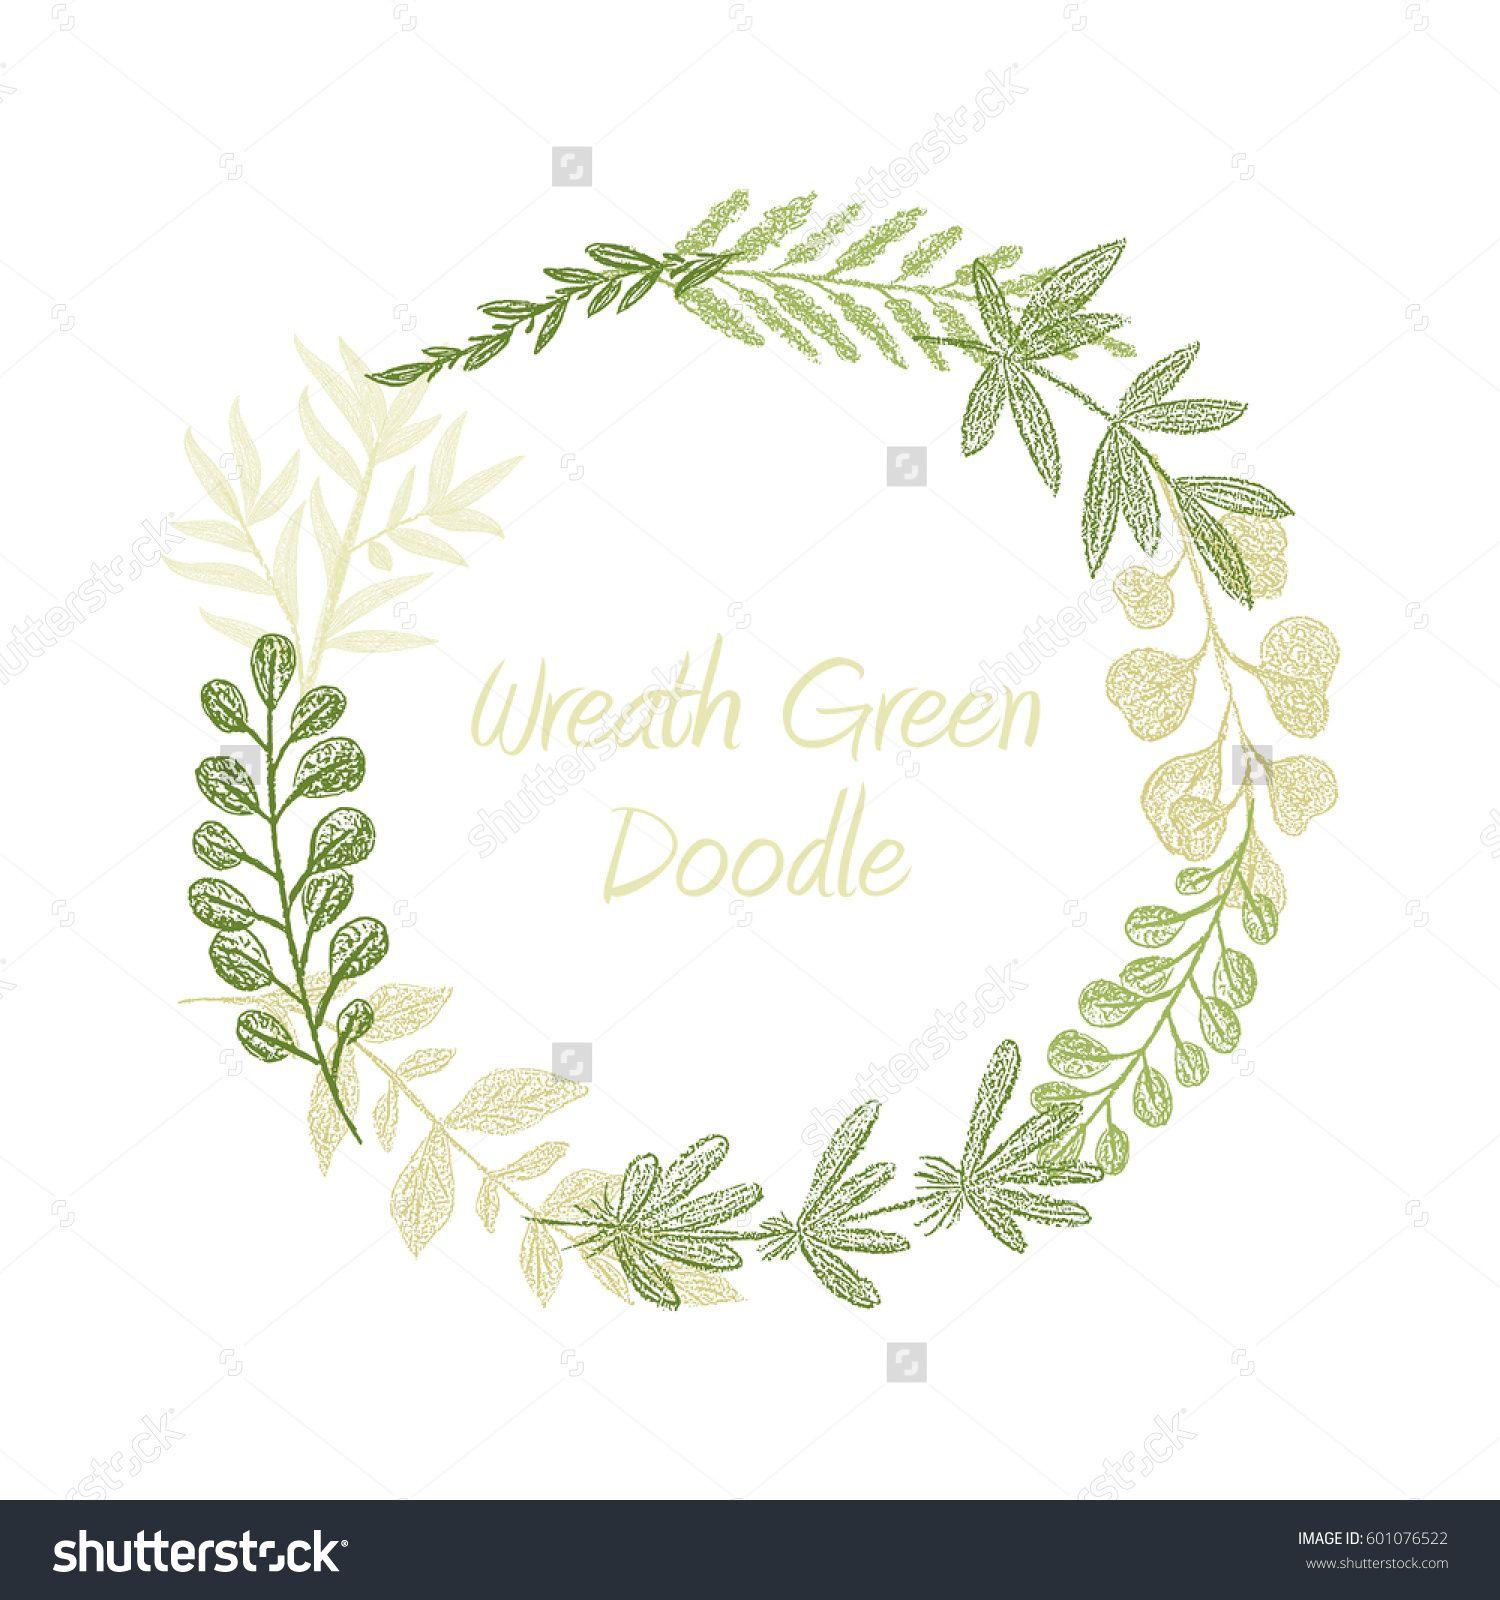 Greenery floral circle wreath vector, greeting, invitation